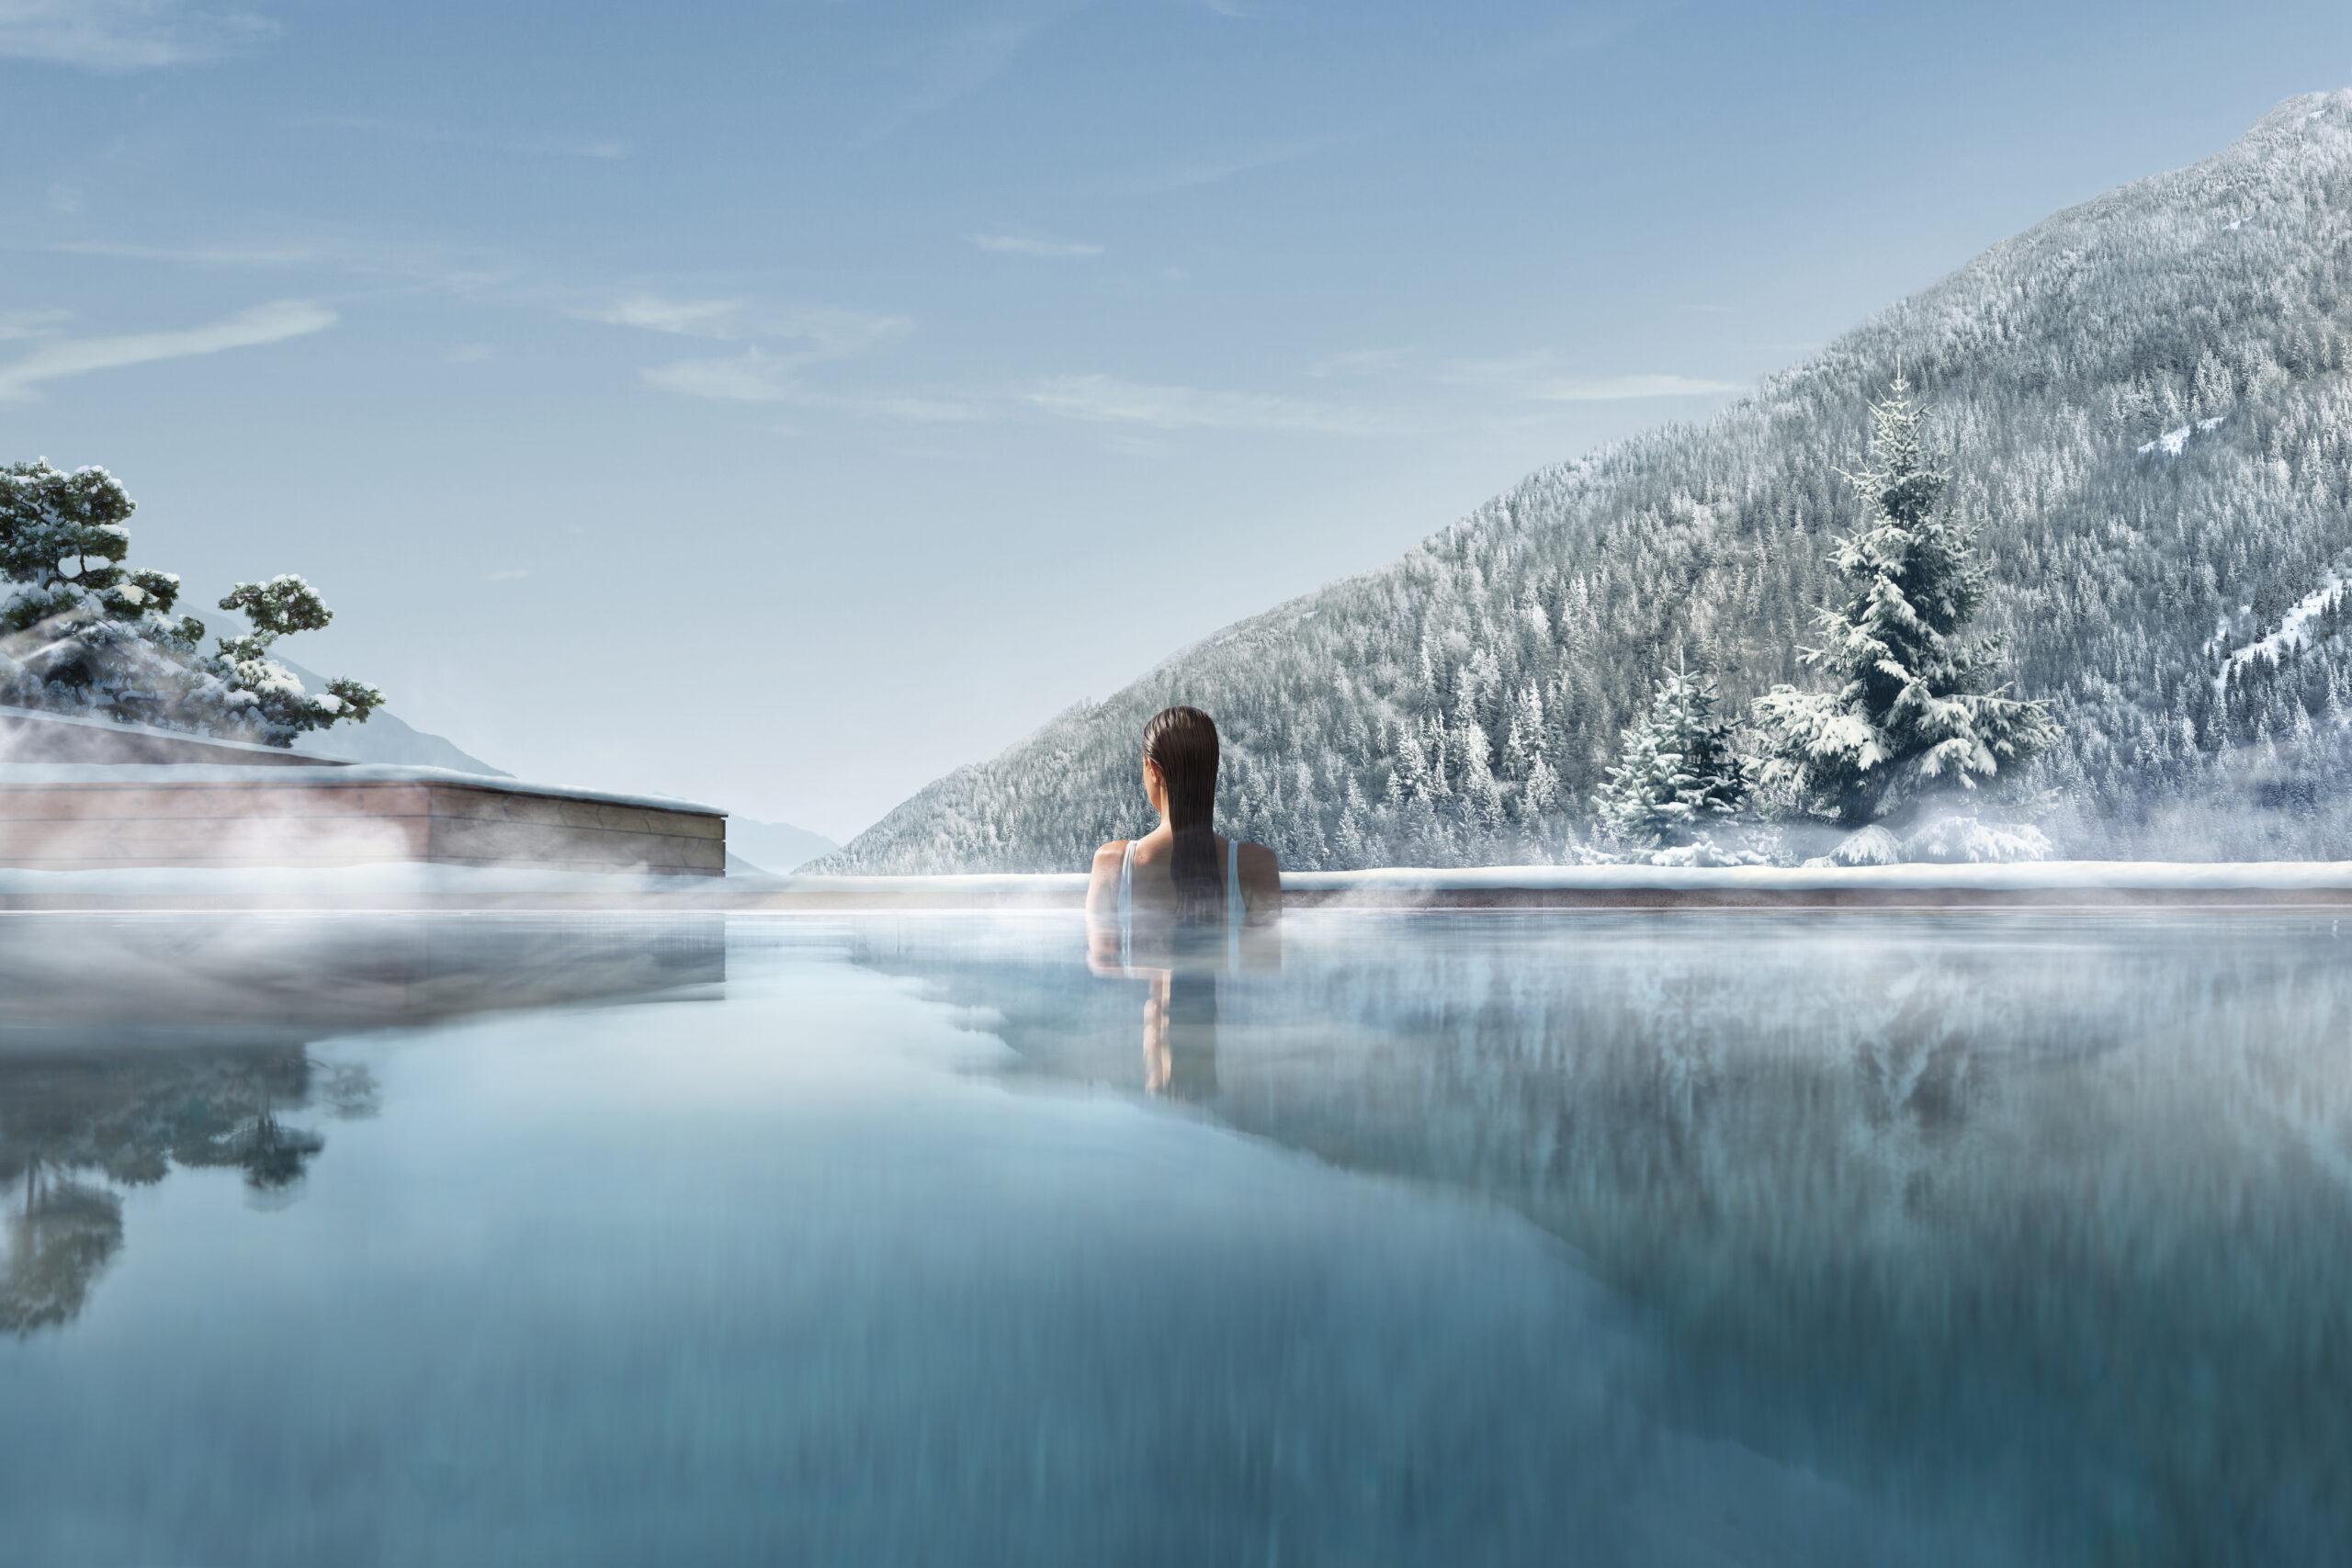 10 Best Retreats to have a Wellness Christmas & New Year - Lefay Resort & Spa Dolomiti, Italy